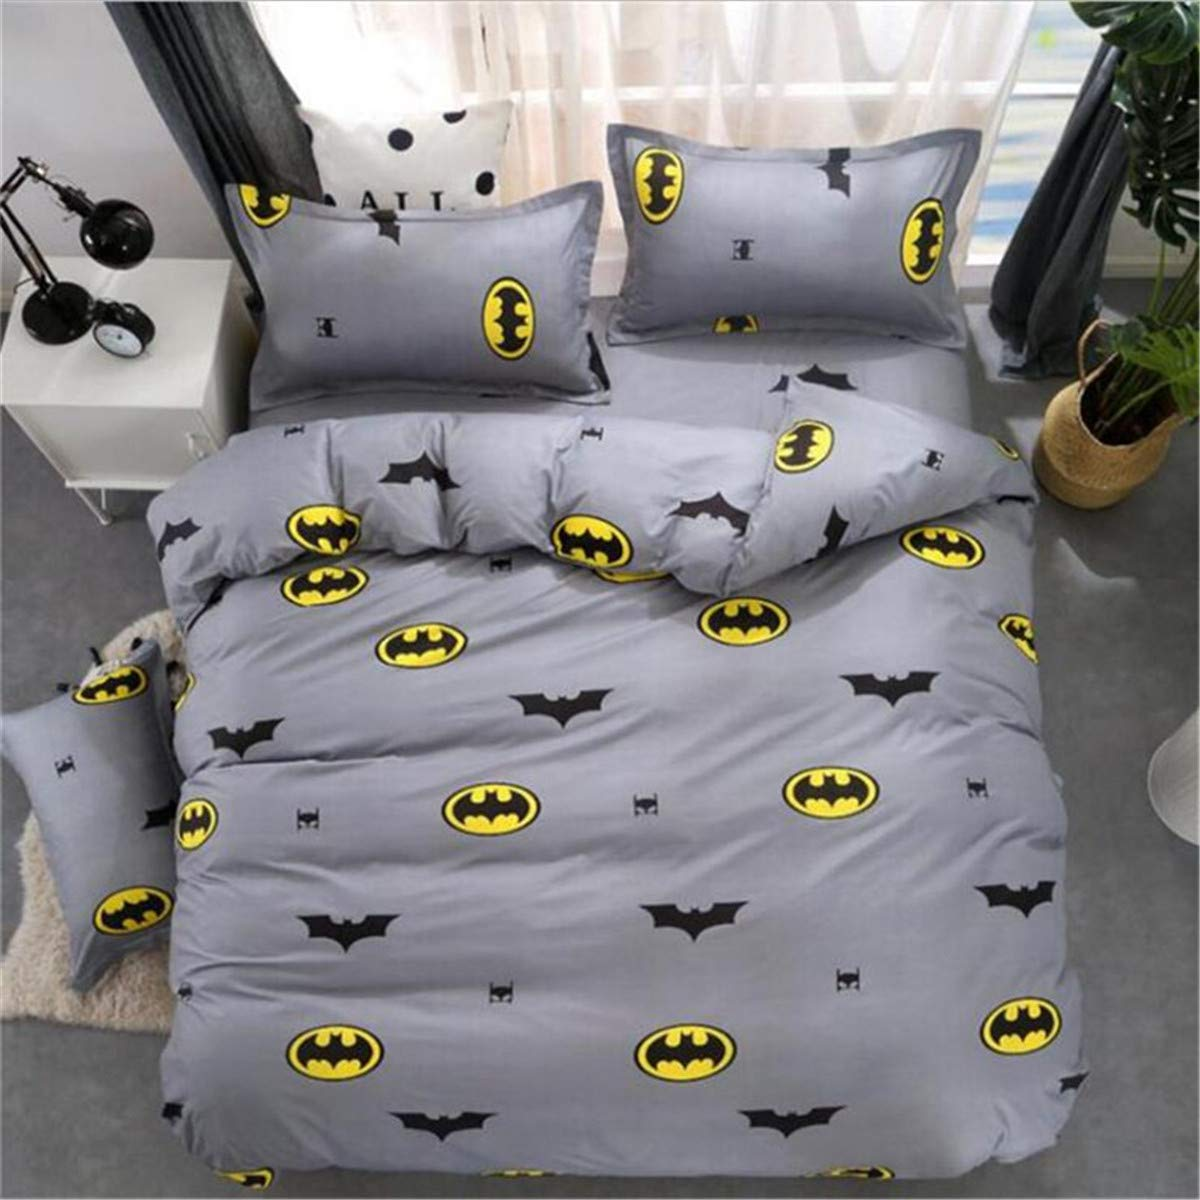 ZI TENG New Cartoon Batman Bedding Set Student Teenagers Love Duvet Cover 3PC100% Polyester Bed Set1Duvet Cover,2Pillowcases,Twin Full Queen Size